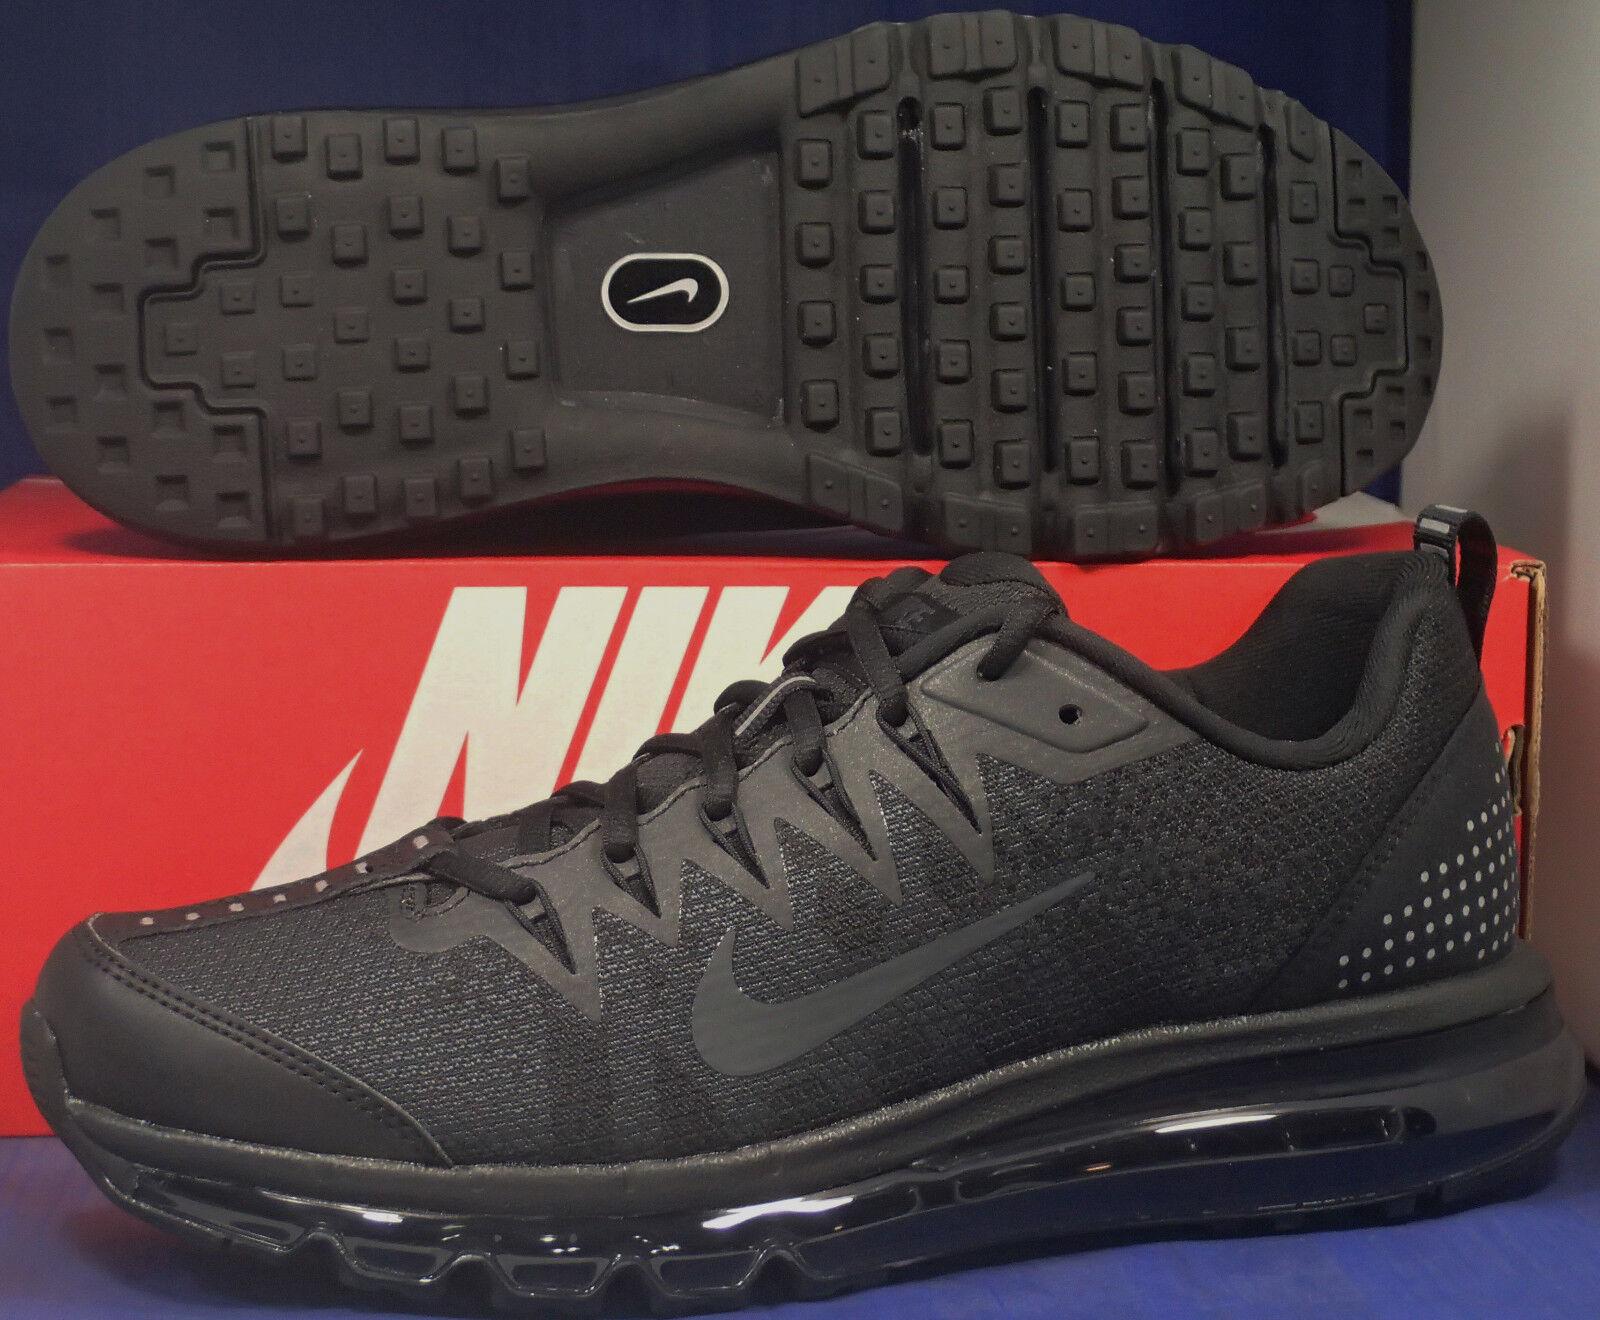 Nike 32 Air Jordan XXXII 32 Nike UNC North Carolina Tar Heels SZ 14 AA1253-406 ae7e0e